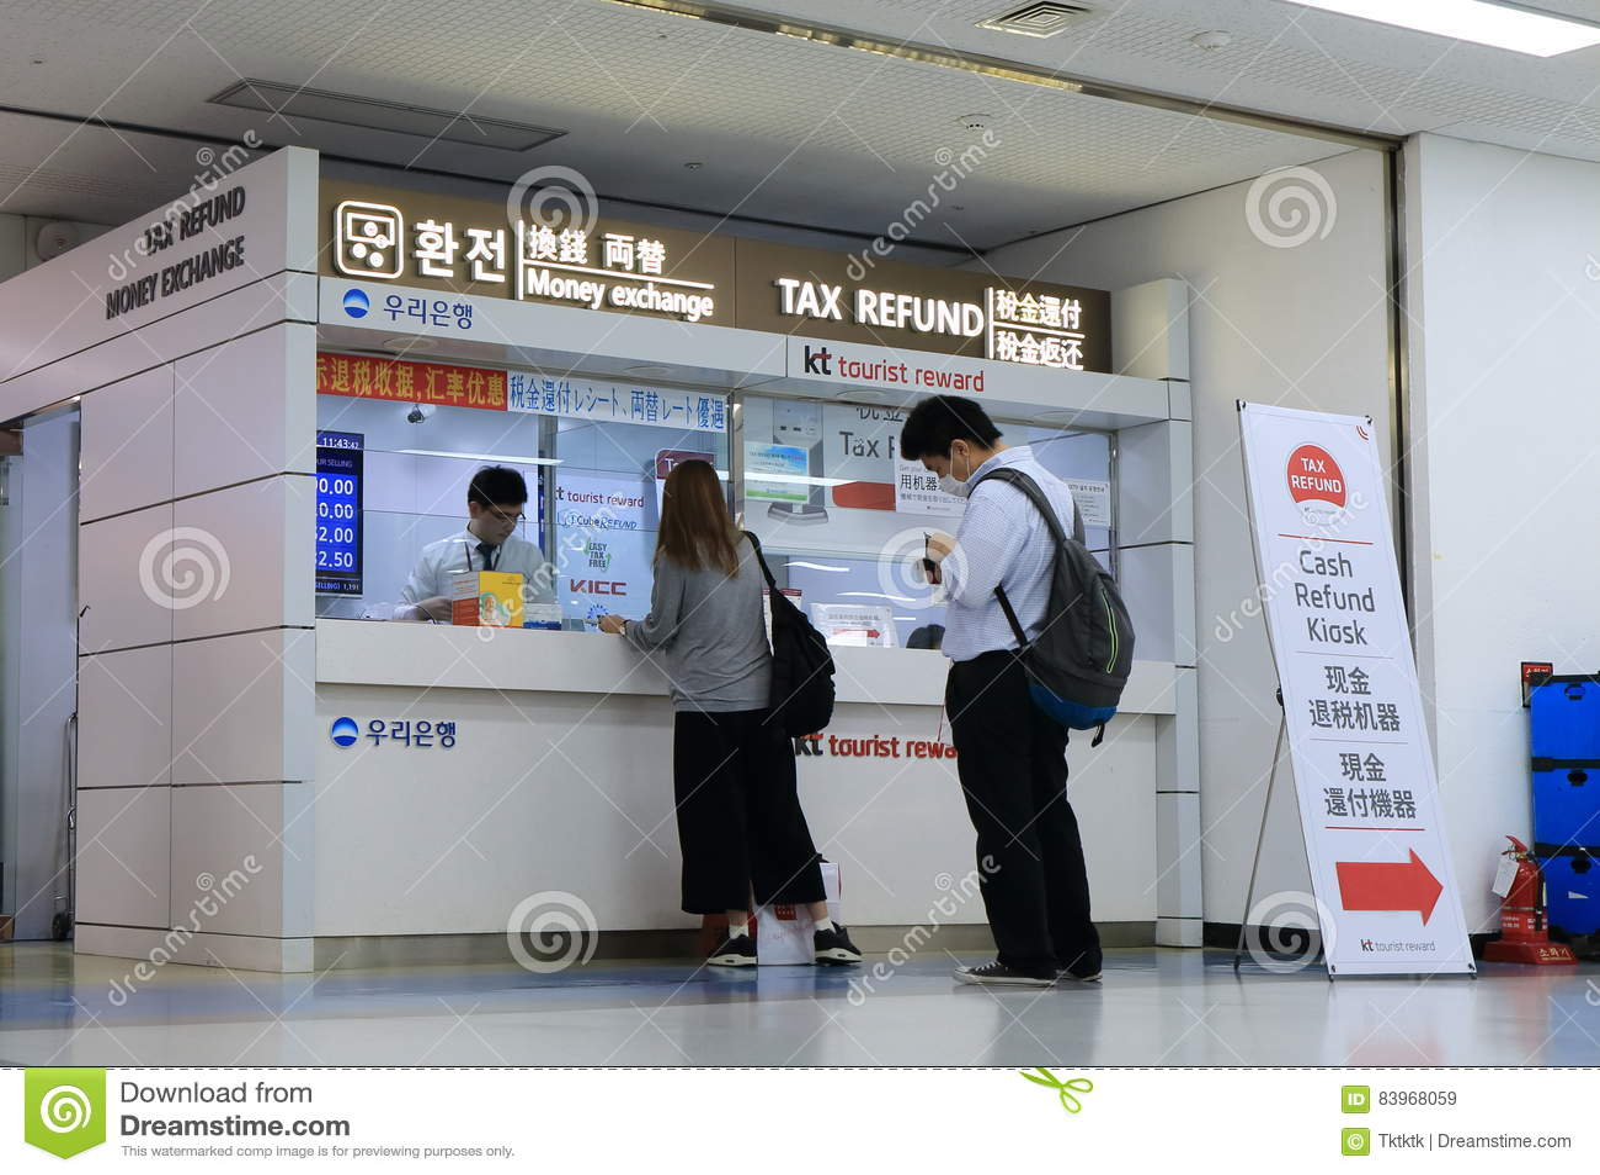 tax refund counter seoul gimpo airport south korea. Black Bedroom Furniture Sets. Home Design Ideas